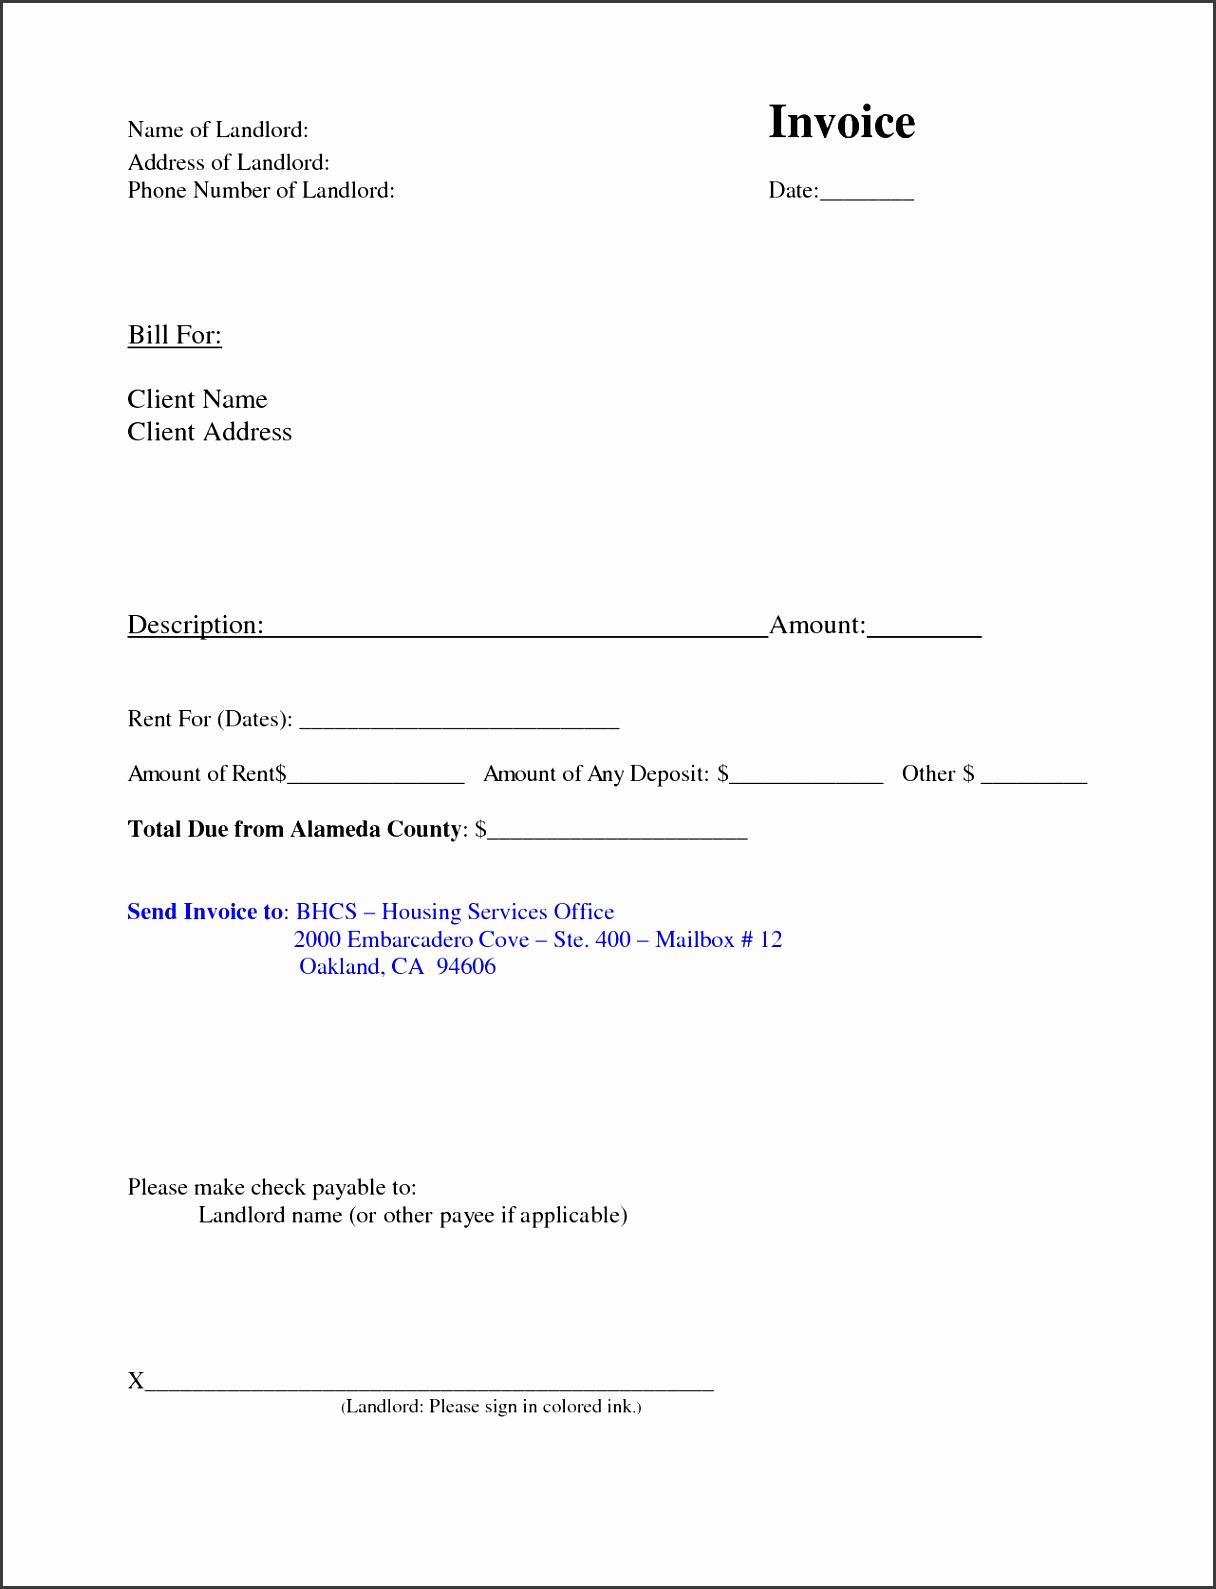 "rent invoice template 圖片 æ²'æœ‰ç¬¦åˆæ¢ä ¶çš""頁面ã€' – 精彩圖片搜"